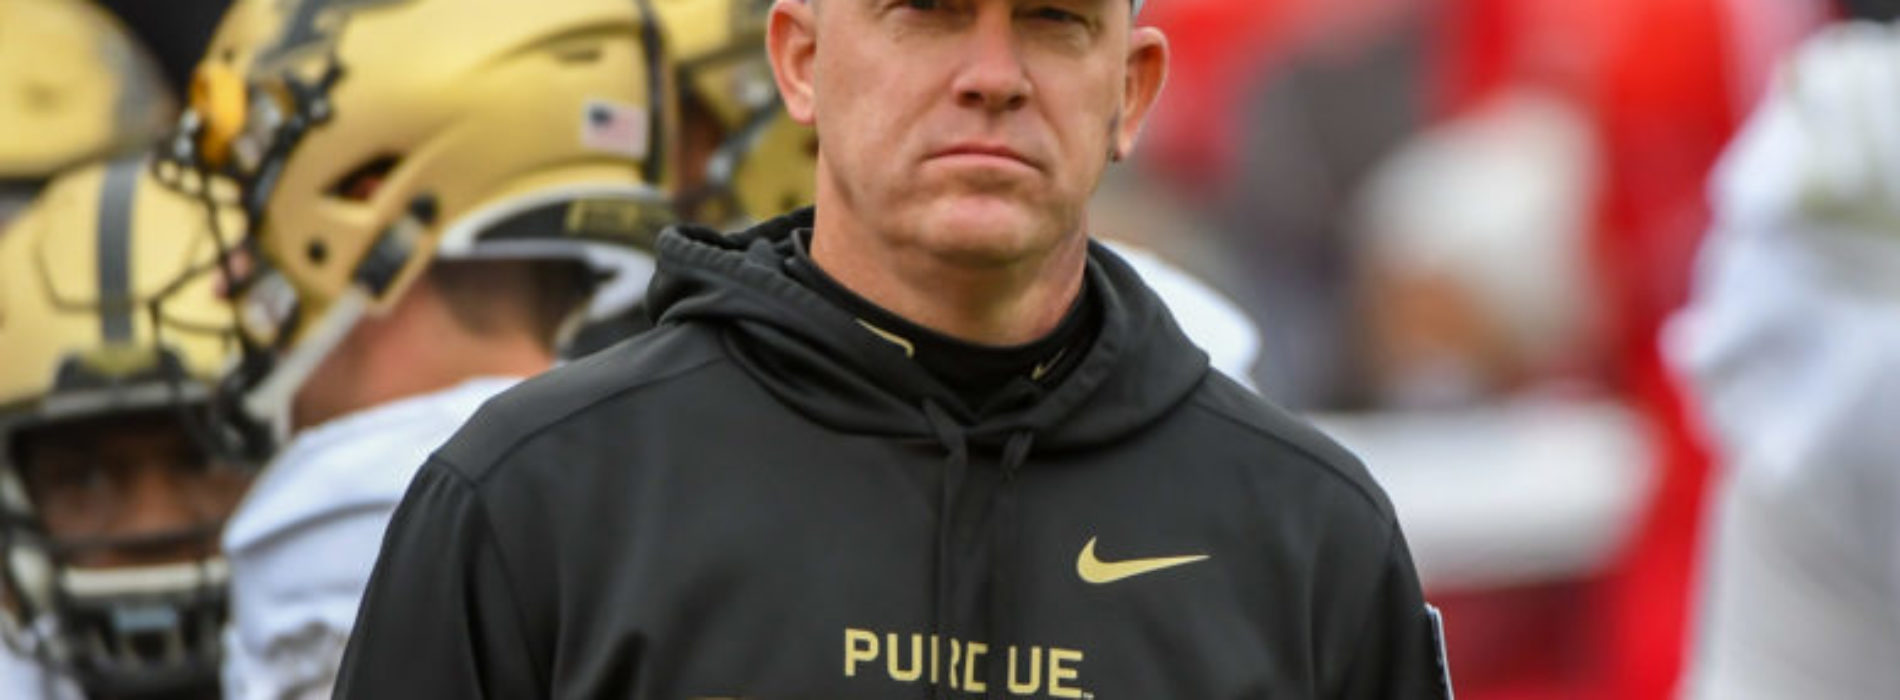 Purdue's Brohm Finalizes Coaching Staff